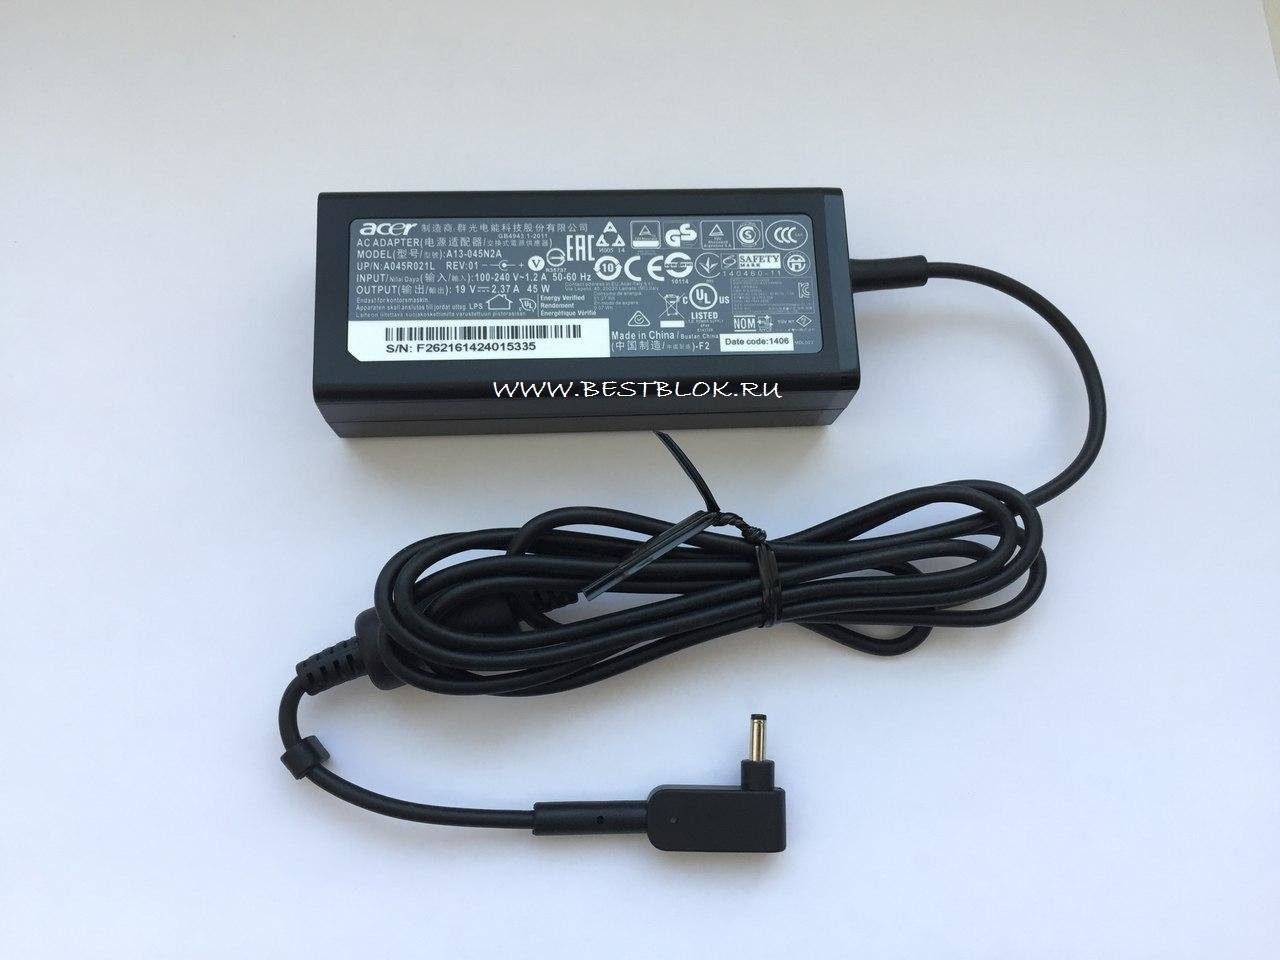 Адаптер блок питания для ноутбука ACER ADP-45HE B A13-045N2A PA-1450-26 Aspire R7-371T-55XH R7-371T-52XE R7-372T-553E-520Q V3-331-P877 V3-371 V3-372 19V-2,37A 45W (3,0*1,1mm)